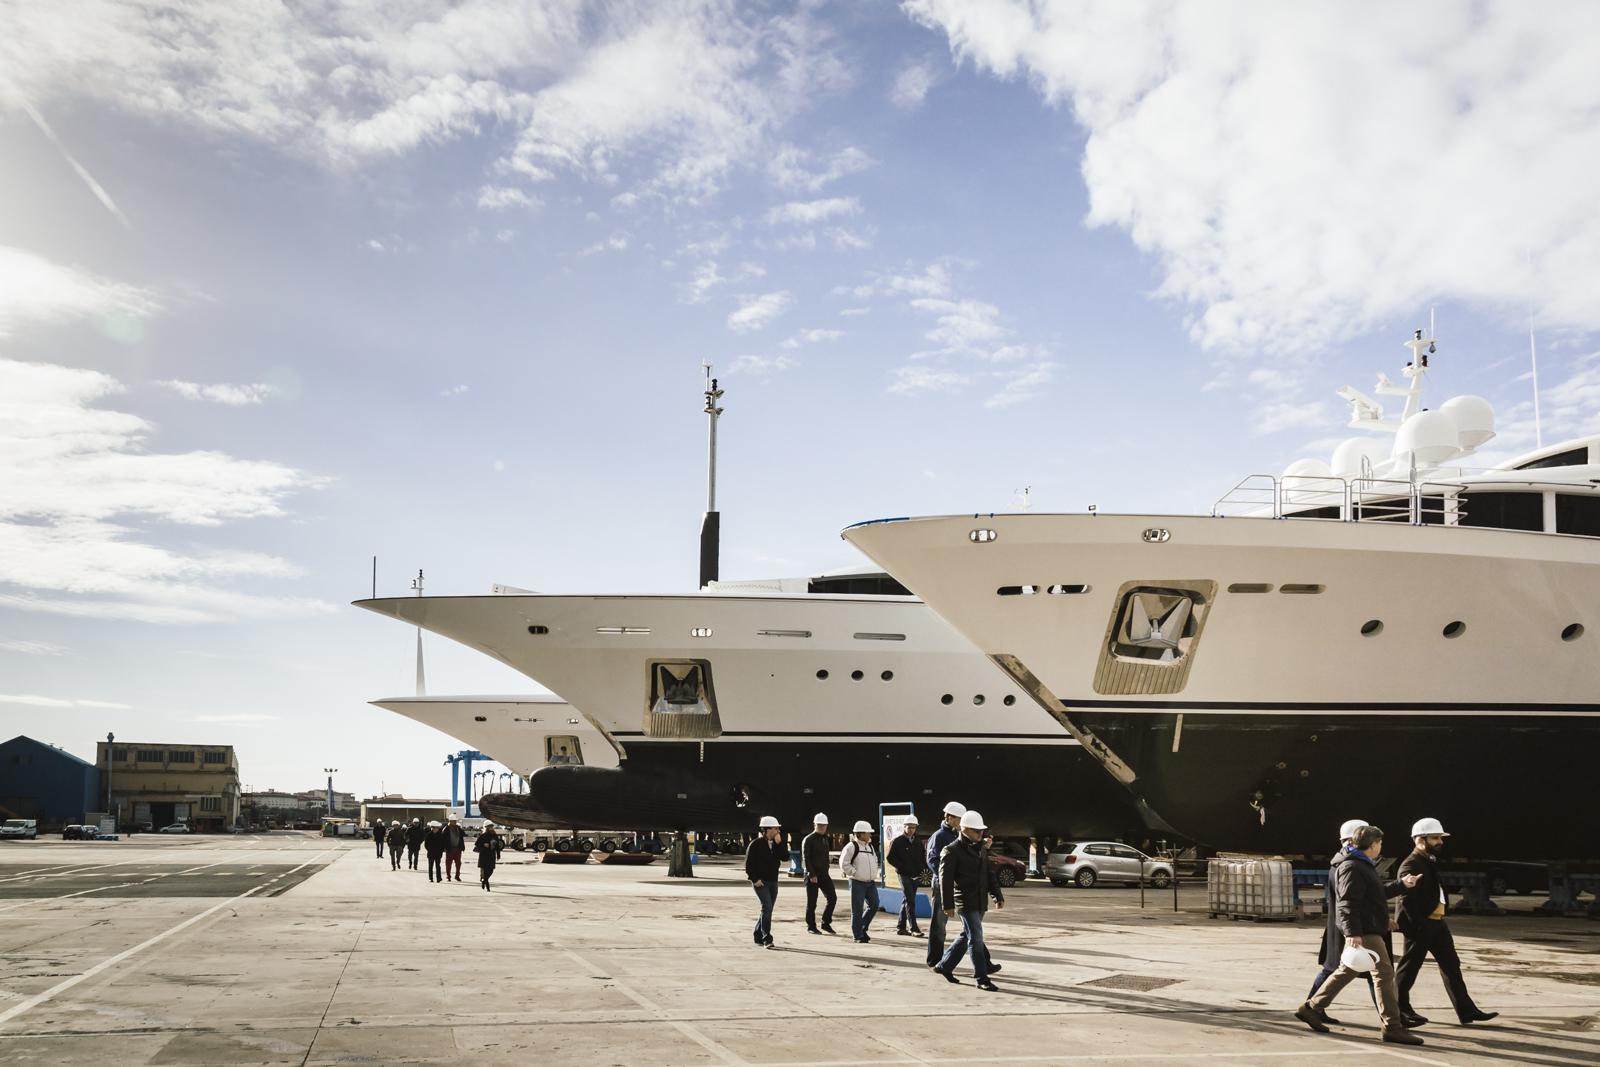 Yare Digital, al Superyacht Forum i numeri della flotta mondiale